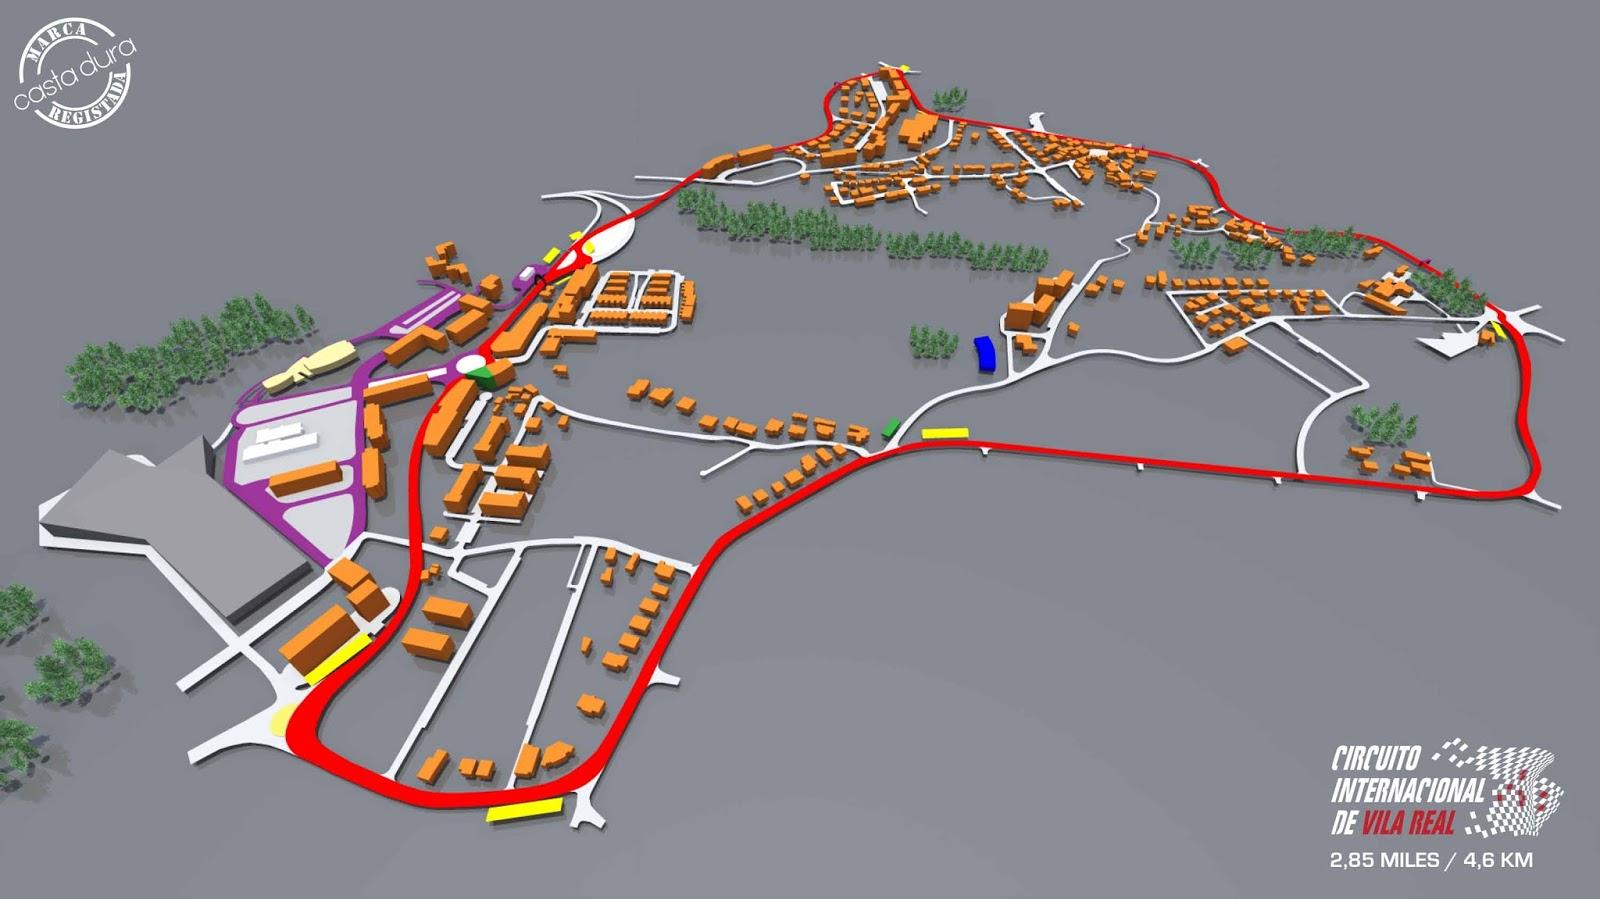 Circuito Vila Real : Caixa de emoções circuito internacional de vila real wtcc